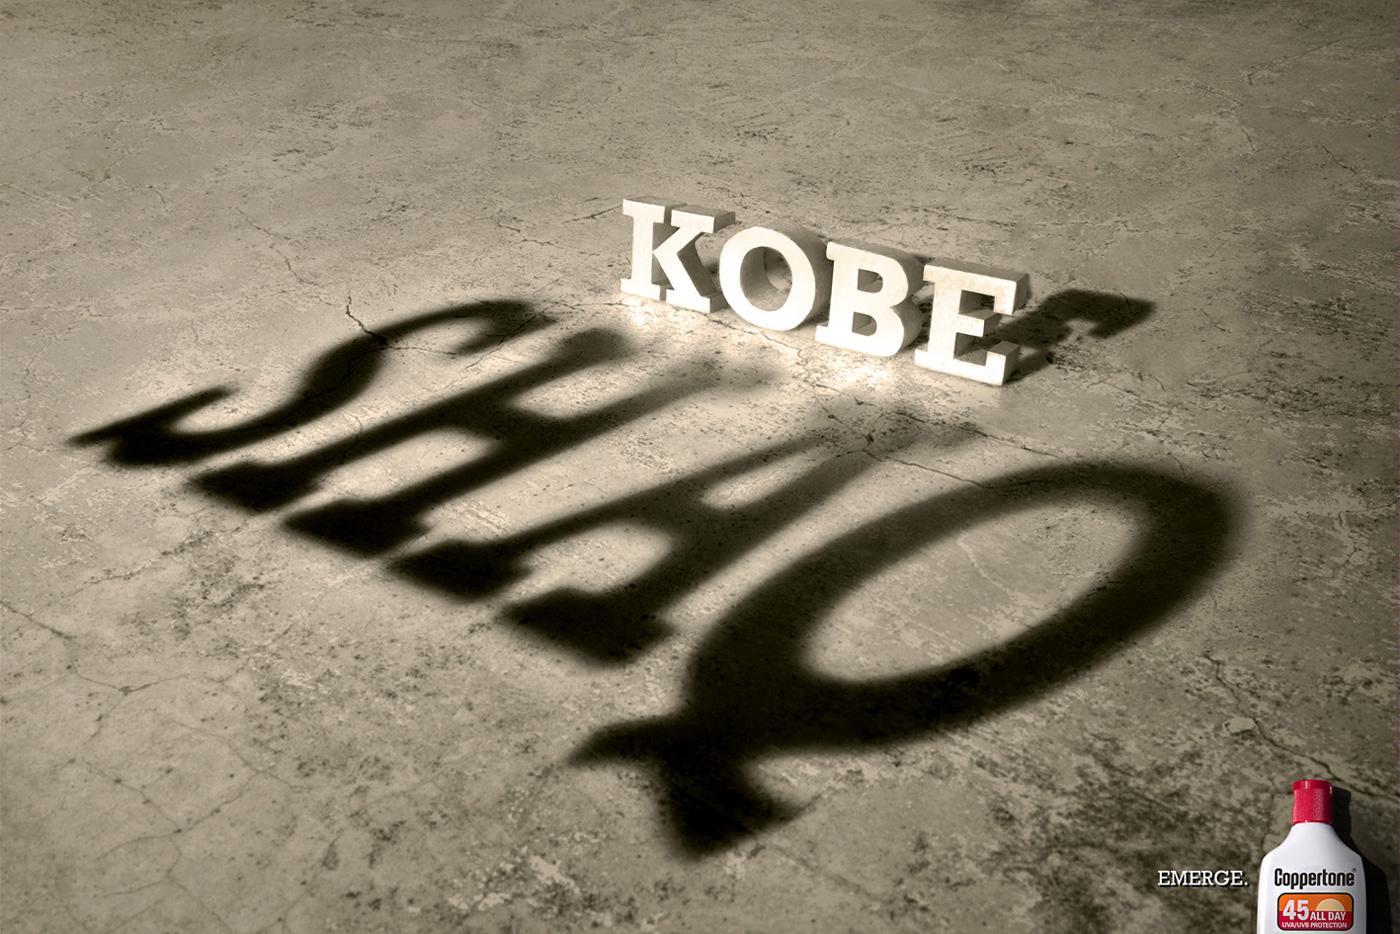 Coppertone Print Ad -  Kobe